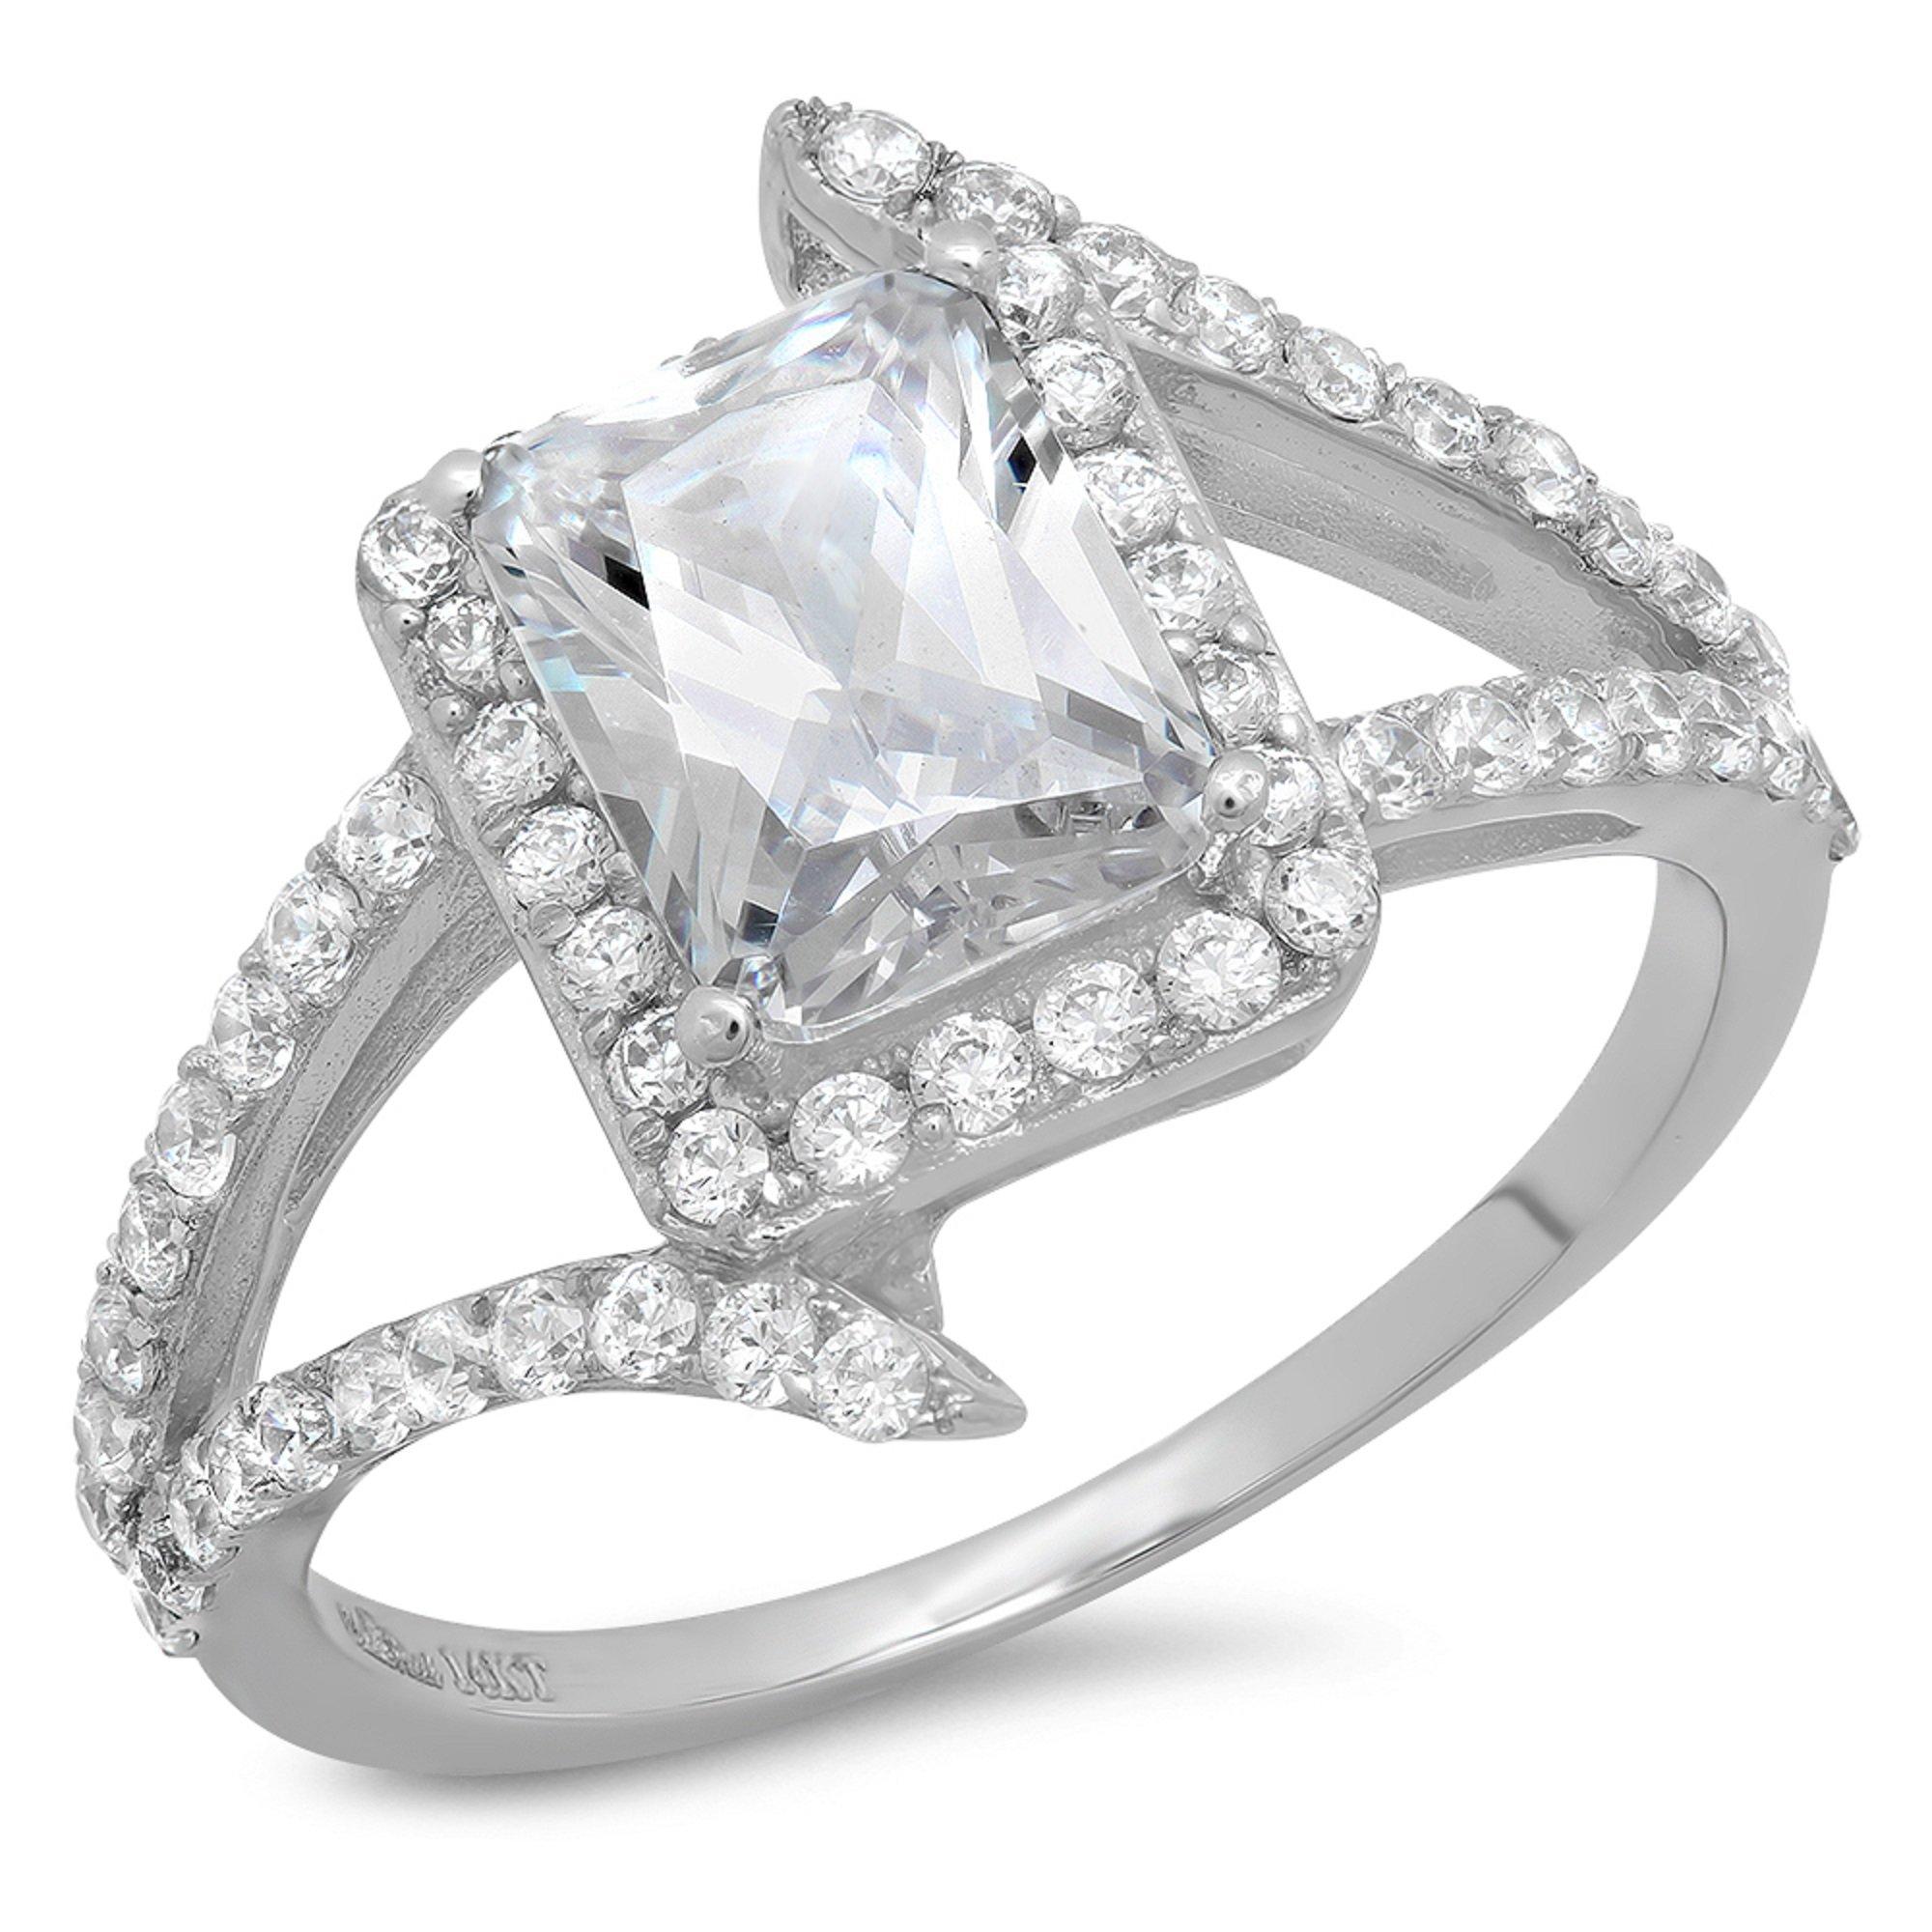 2.3 Ct Emerald Cut Criss Cross Engagement Wedding Bridal Anniversary Ring 14K White Gold, Size 8.25, Clara Pucci